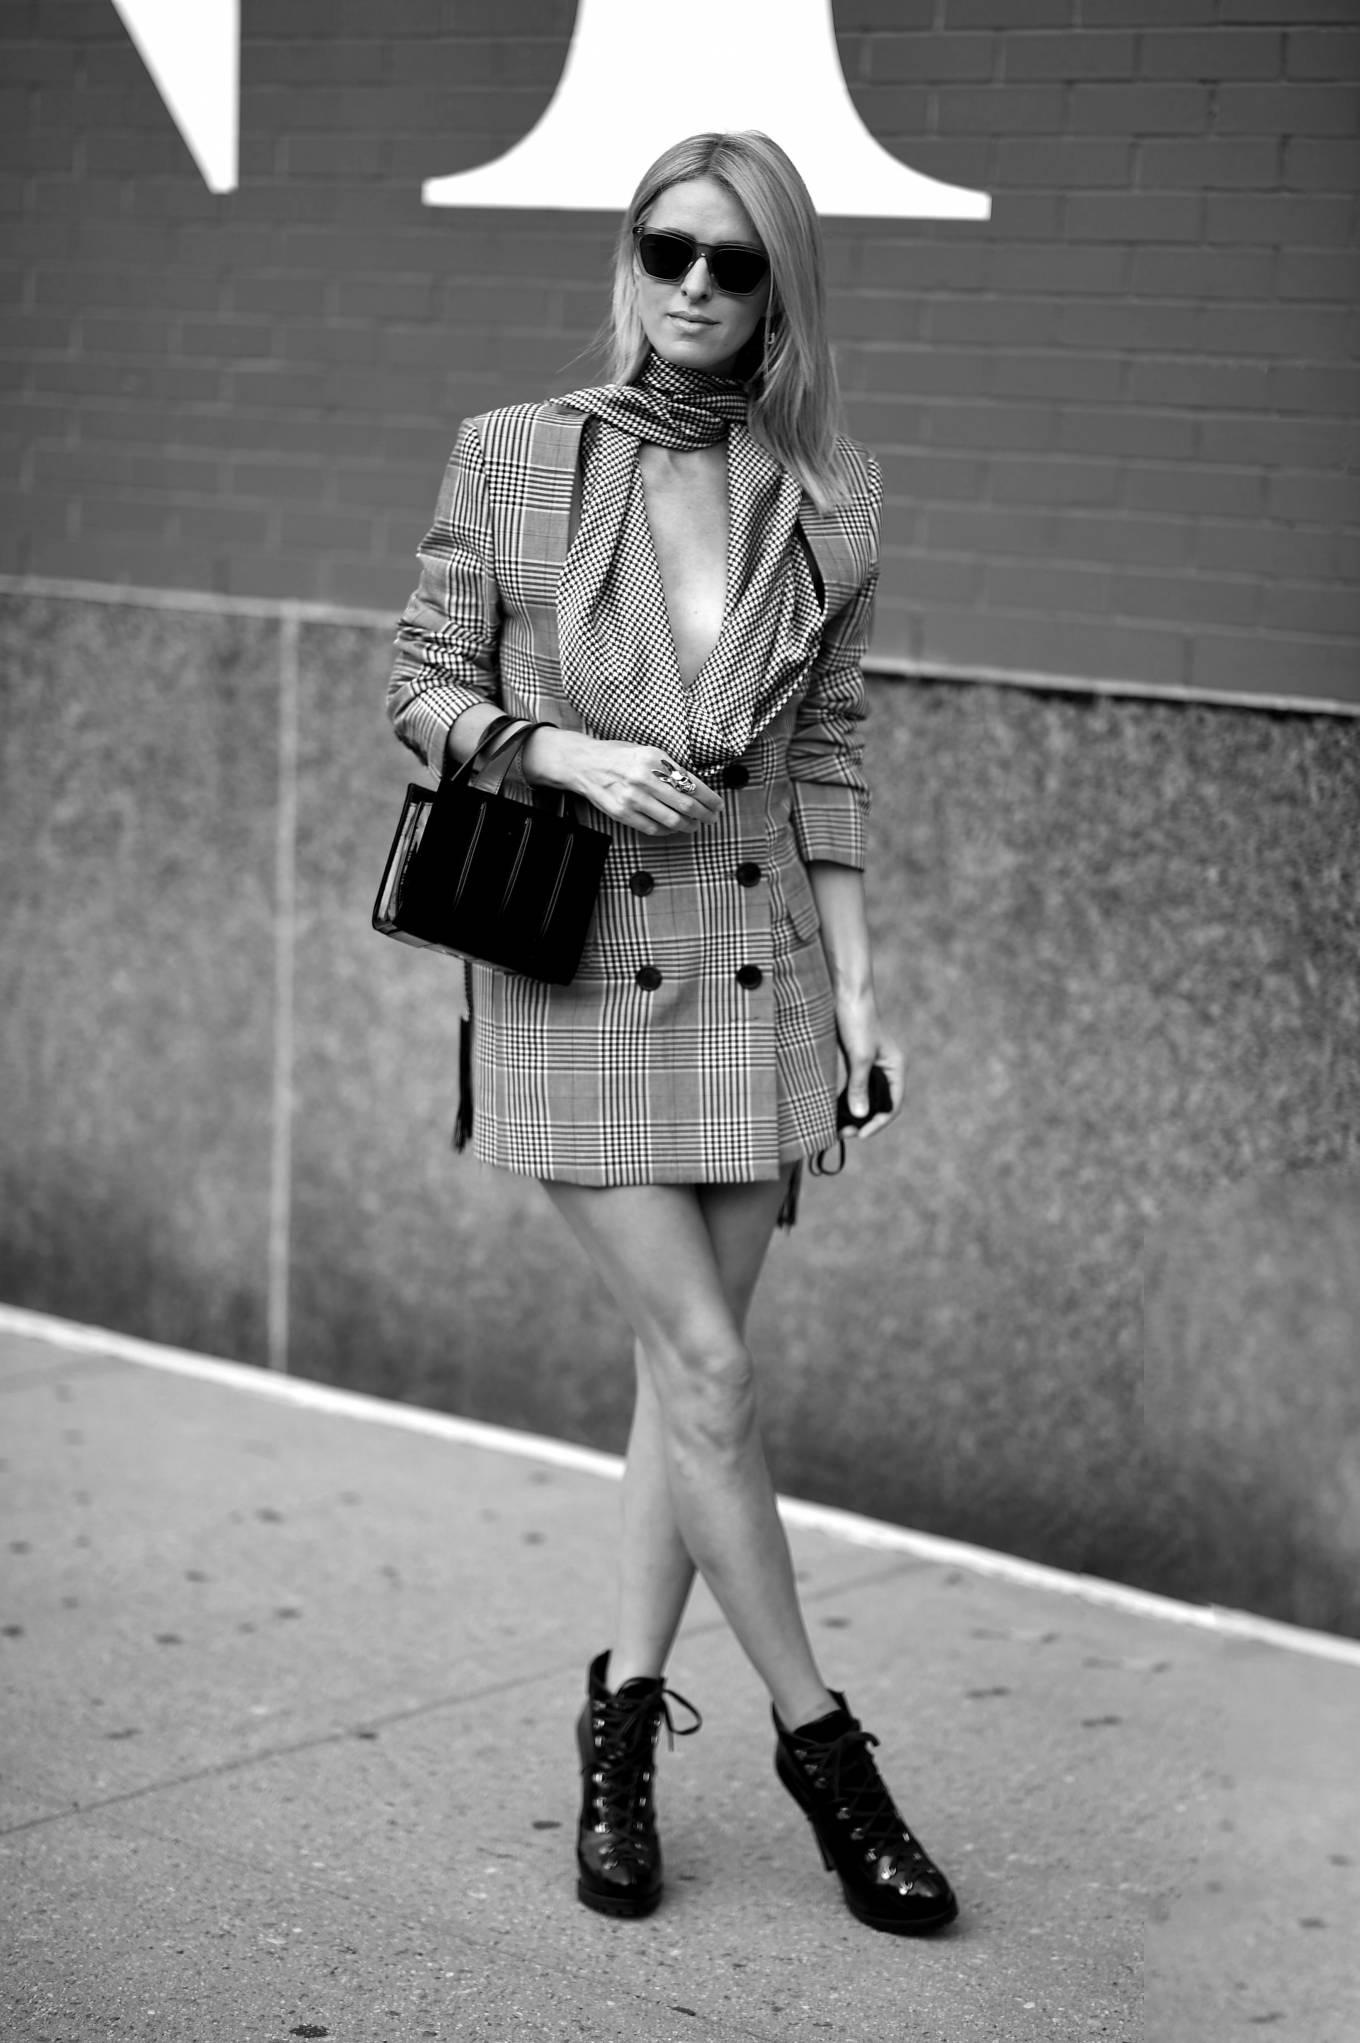 Nicky Hilton 2020 : Nicky Hilton – New York Fashion Week – Monse Fall-Winter 2020 Presentation-37